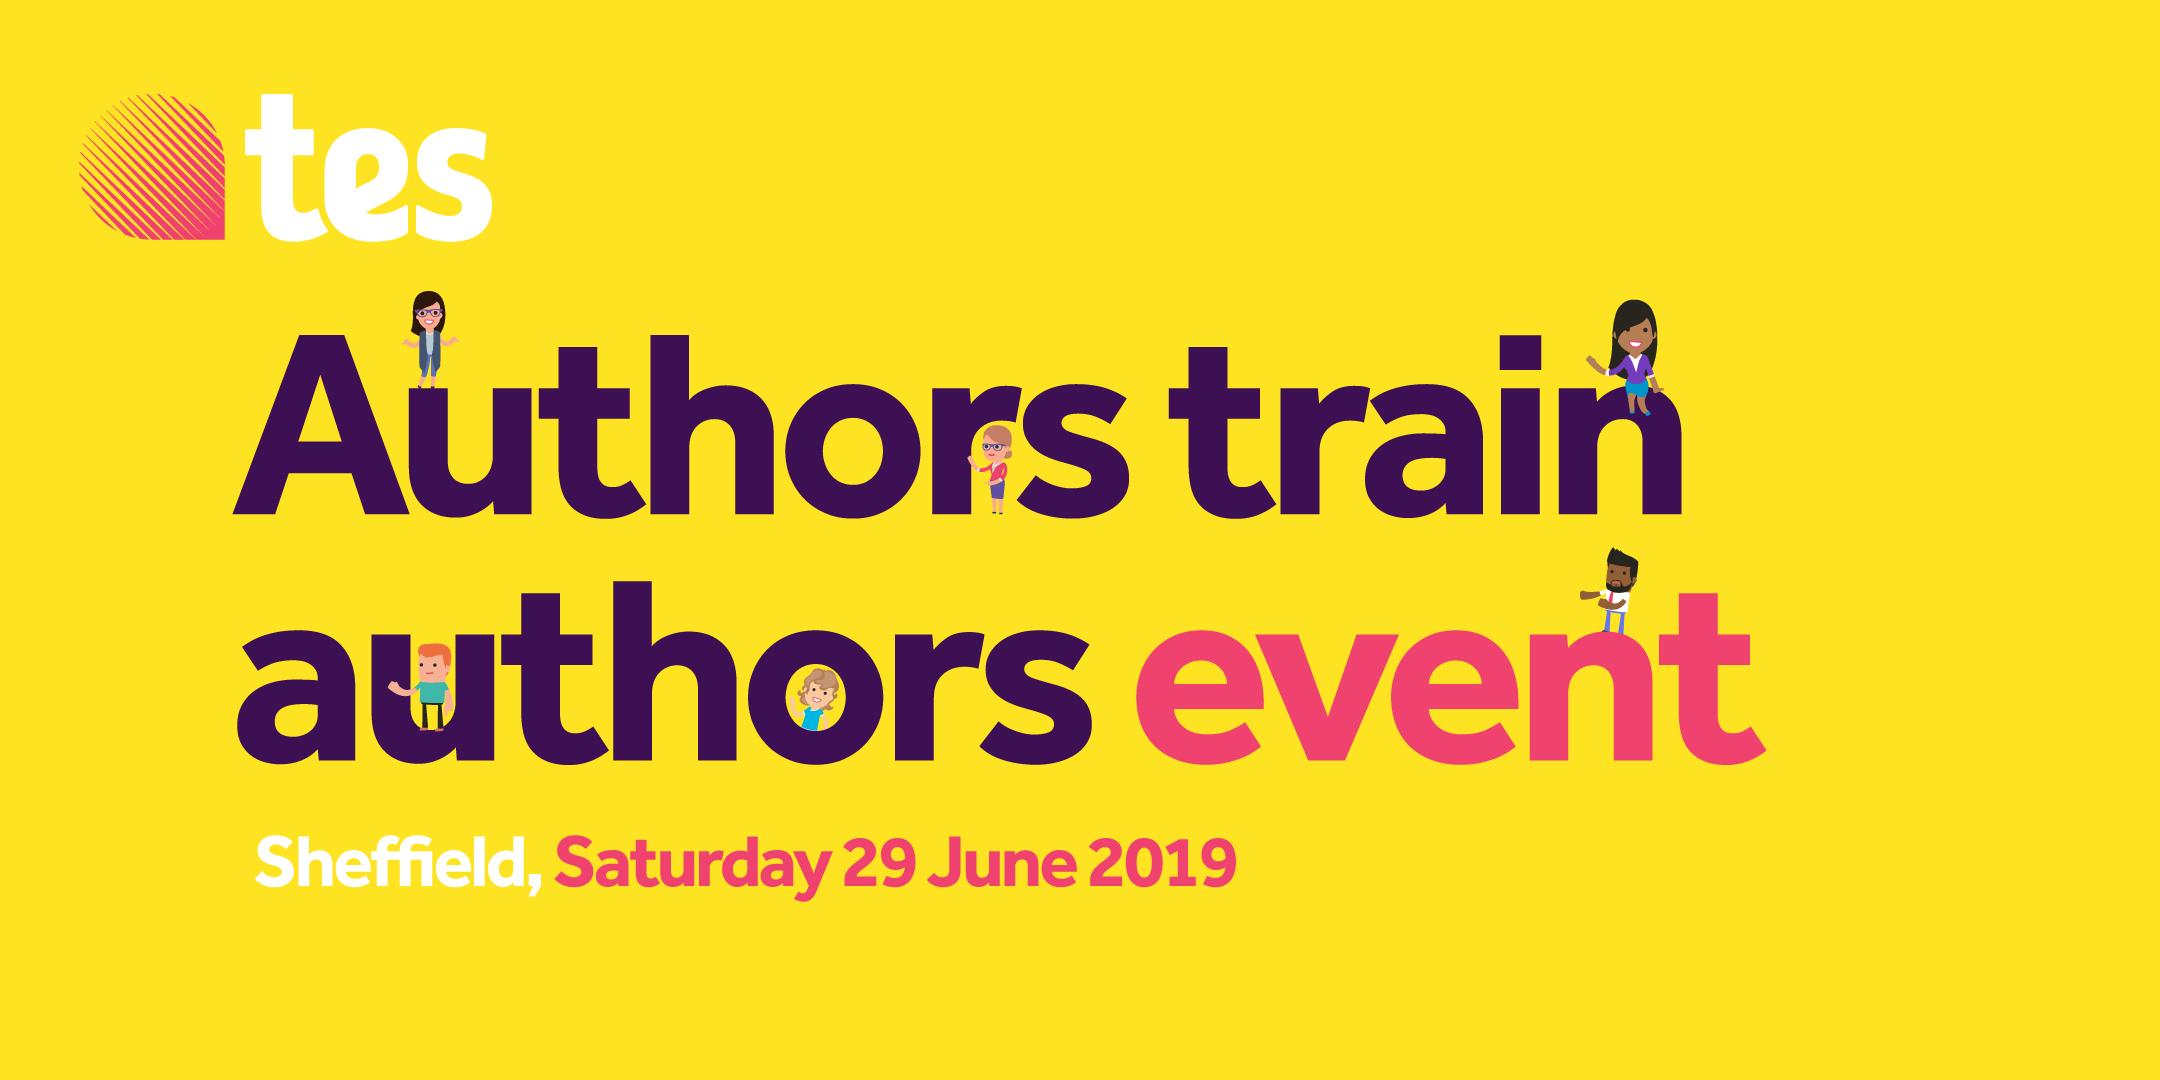 Authors train authors event